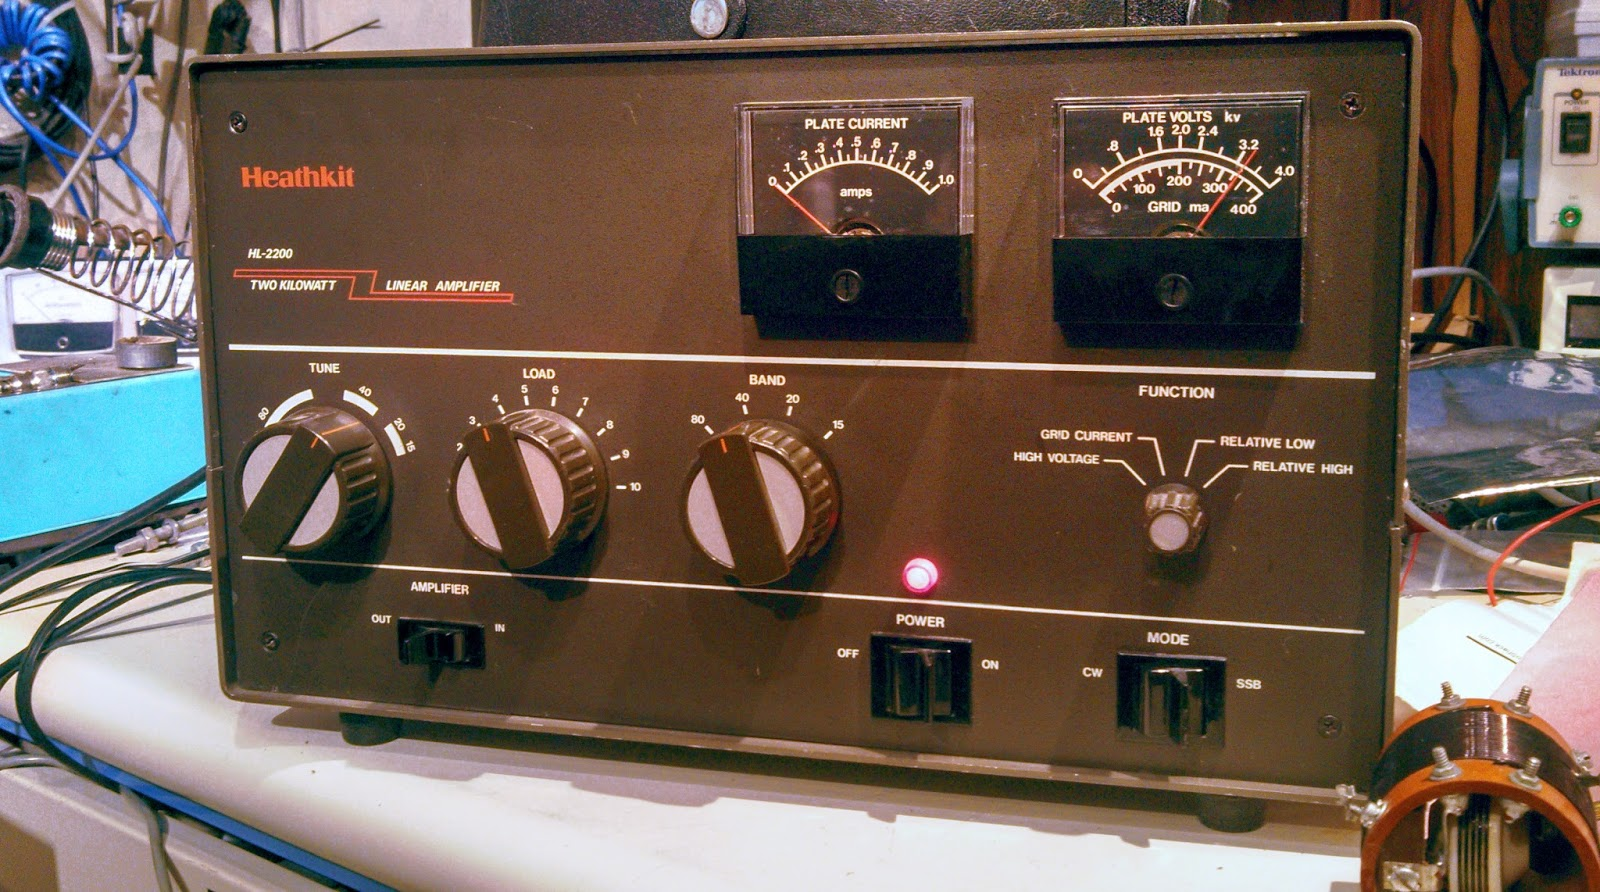 KA7OEI's blog: Repairing the TUNE capacitor on the Heathkit